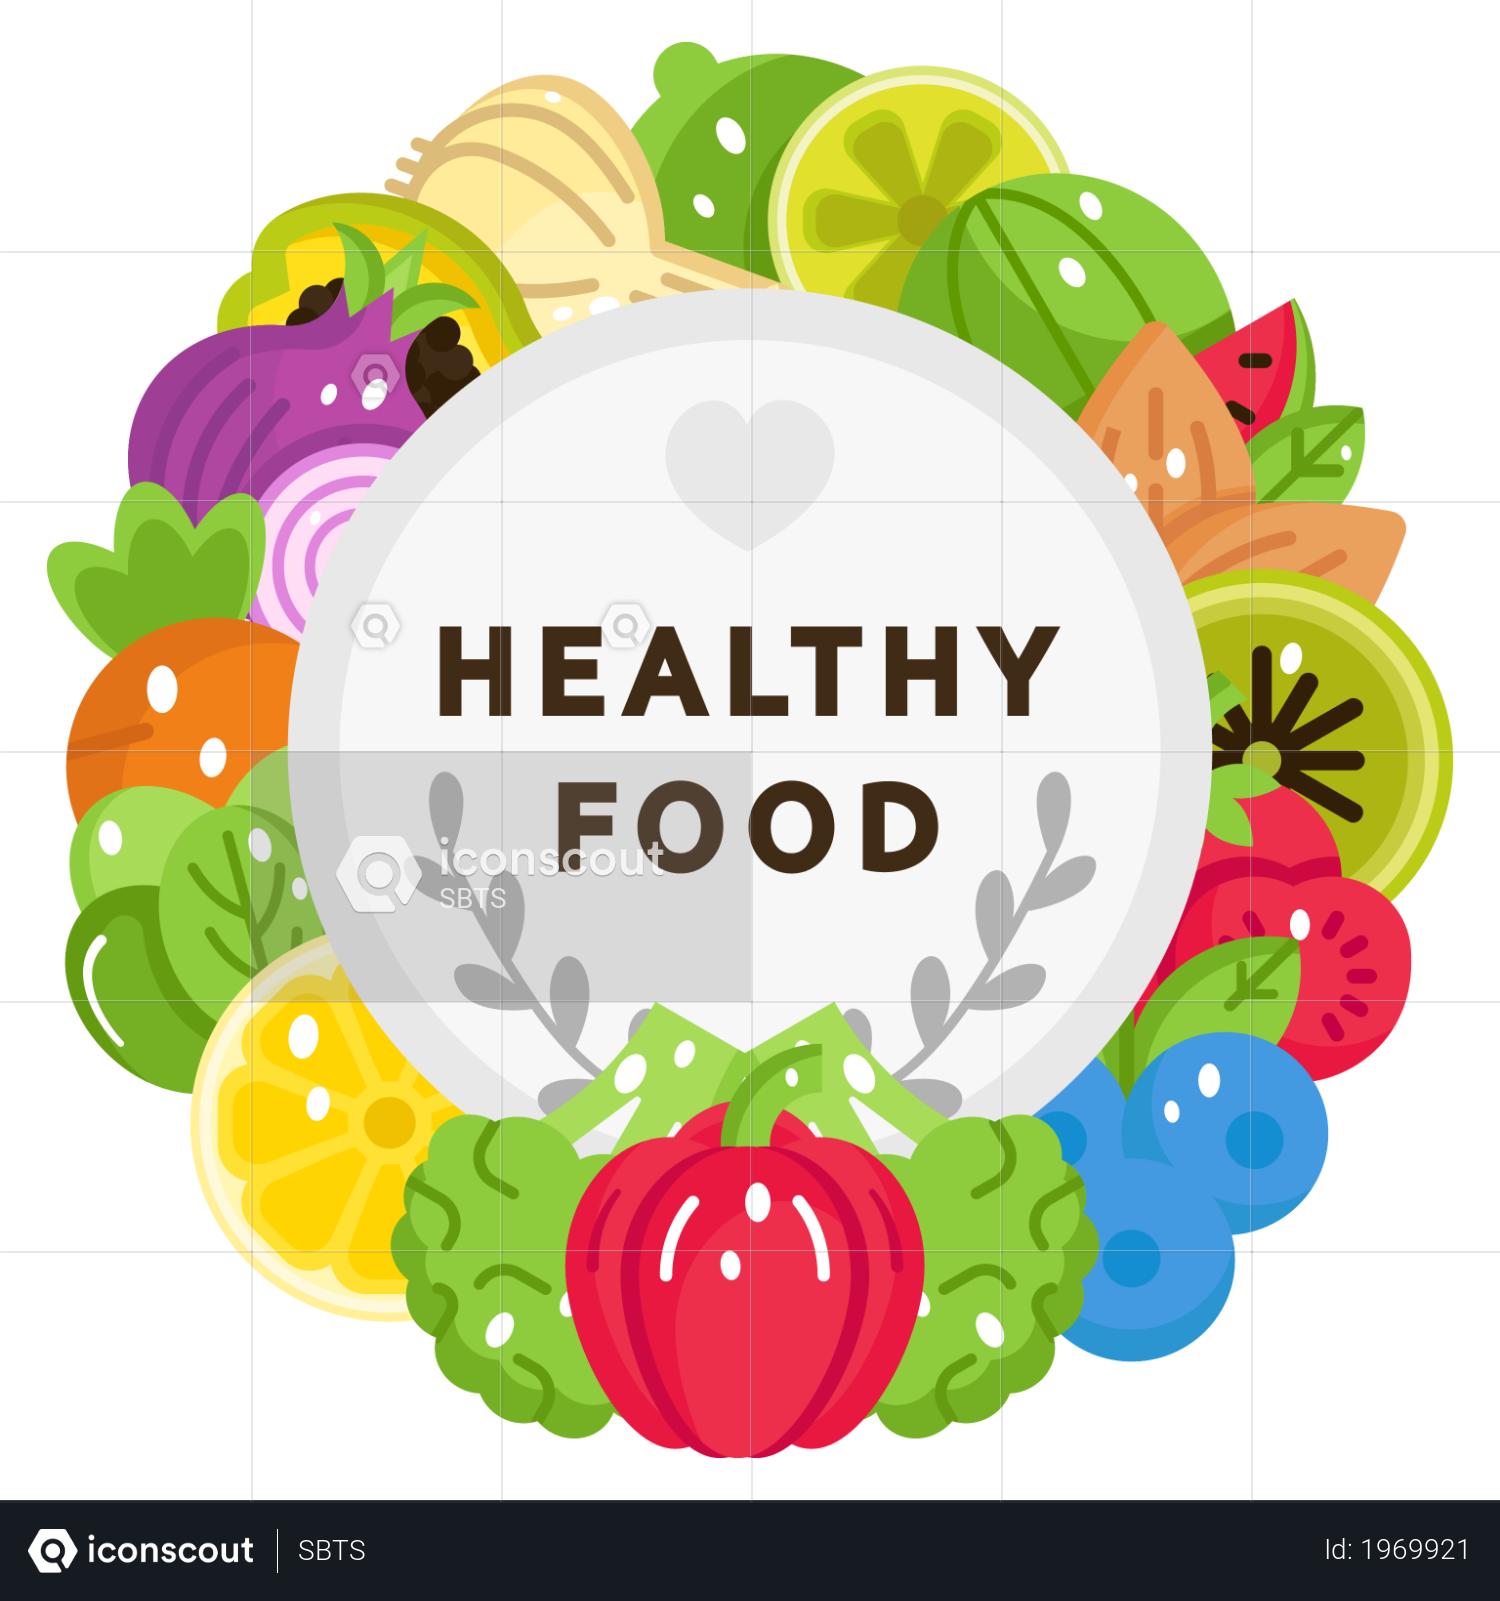 Premium Healthy Food Illustration Download In Png Vector Format